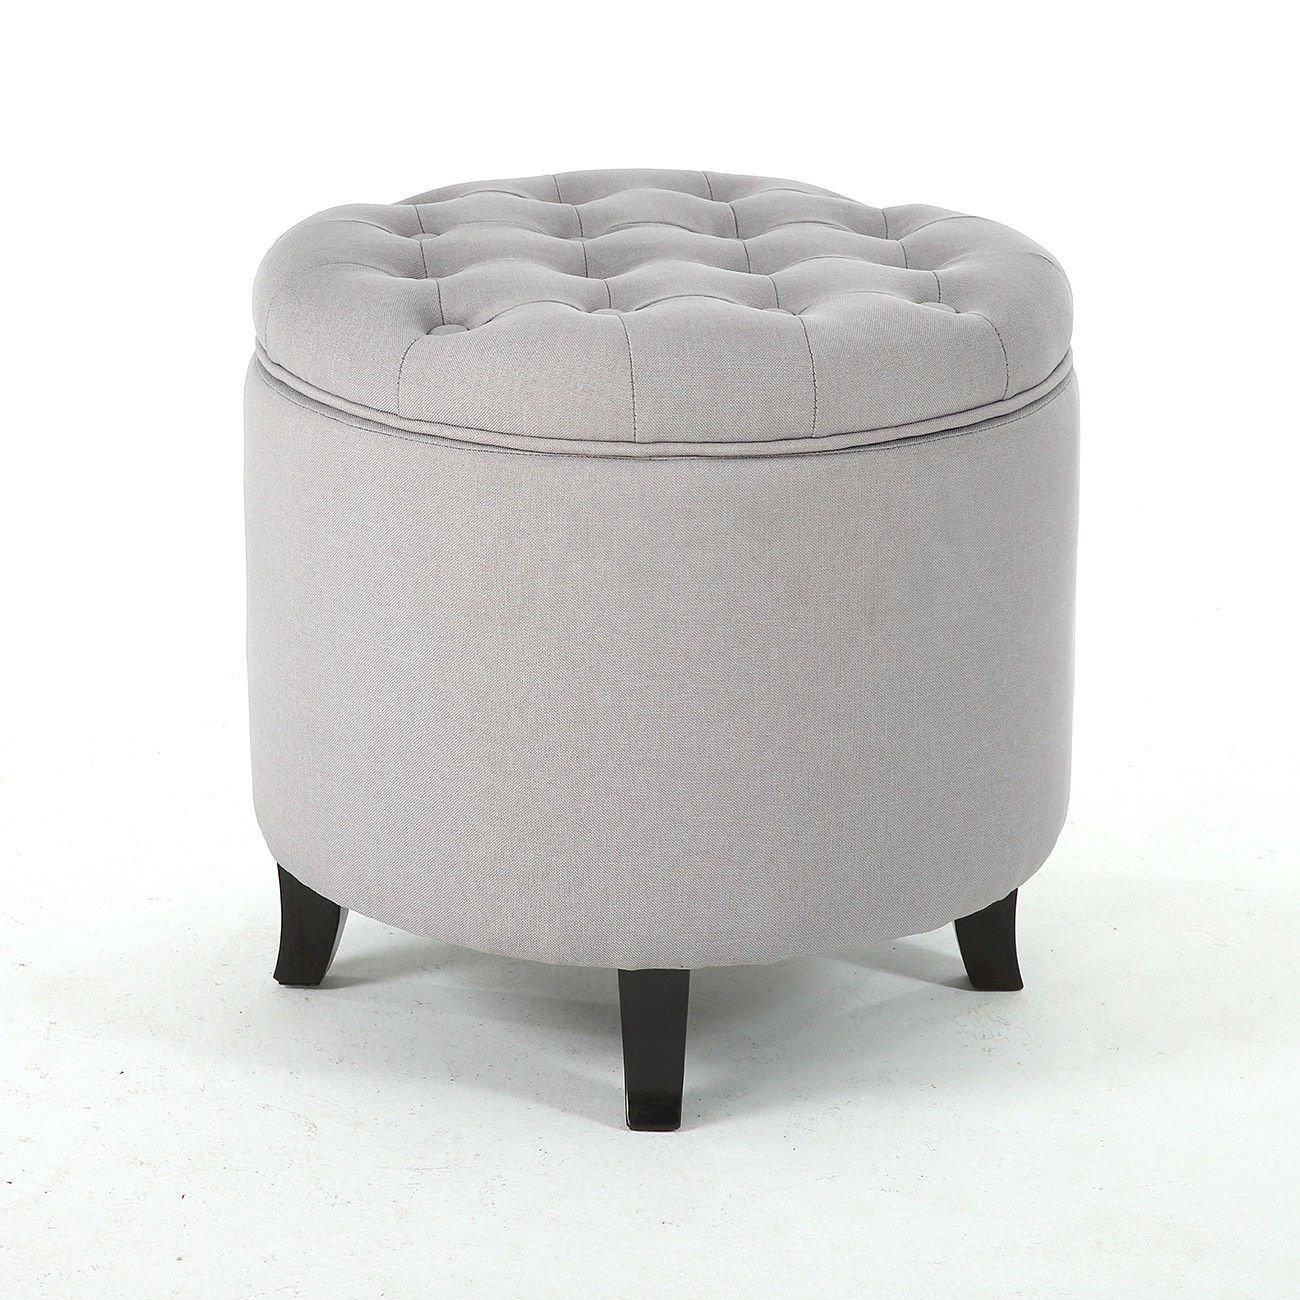 Wondrous Amazon Com Storage Ottoman Seat Nailhead Trim Large Round Caraccident5 Cool Chair Designs And Ideas Caraccident5Info